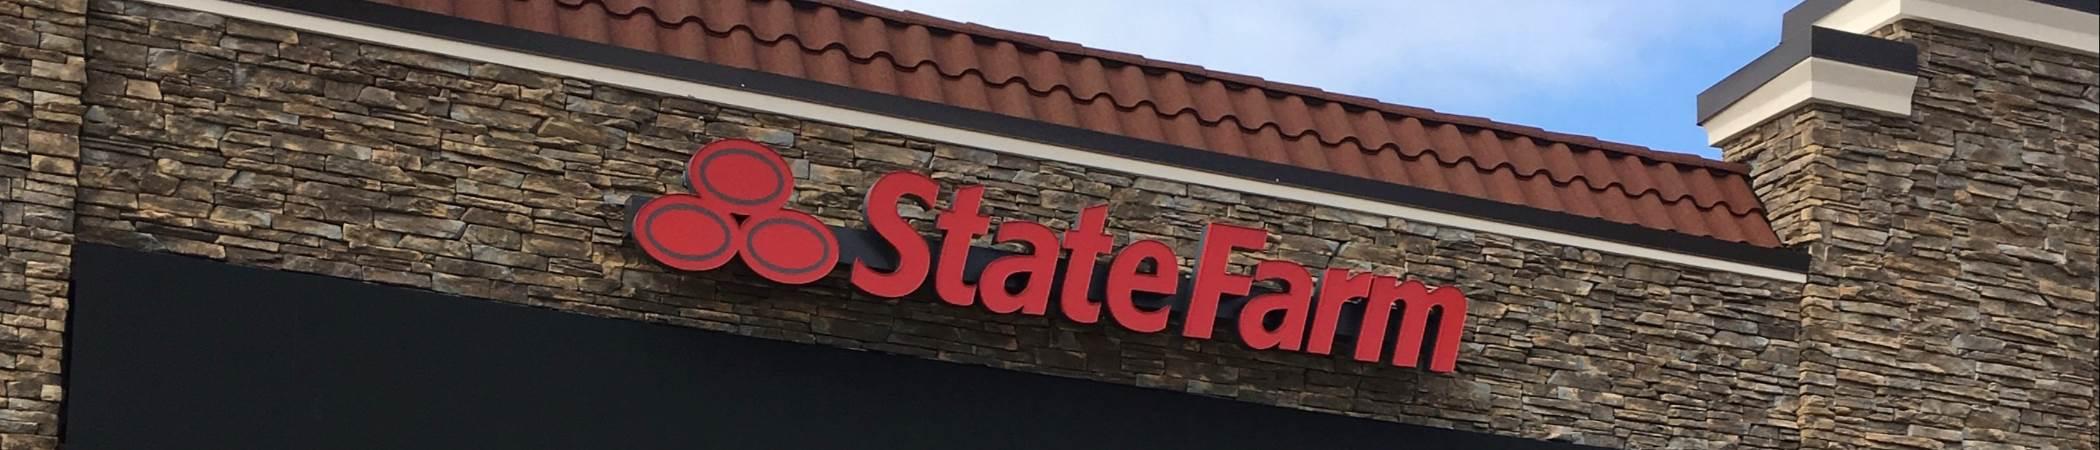 Glenda Petkus State Farm Insurance in Southlake, TX | Home, Auto Insurance & more